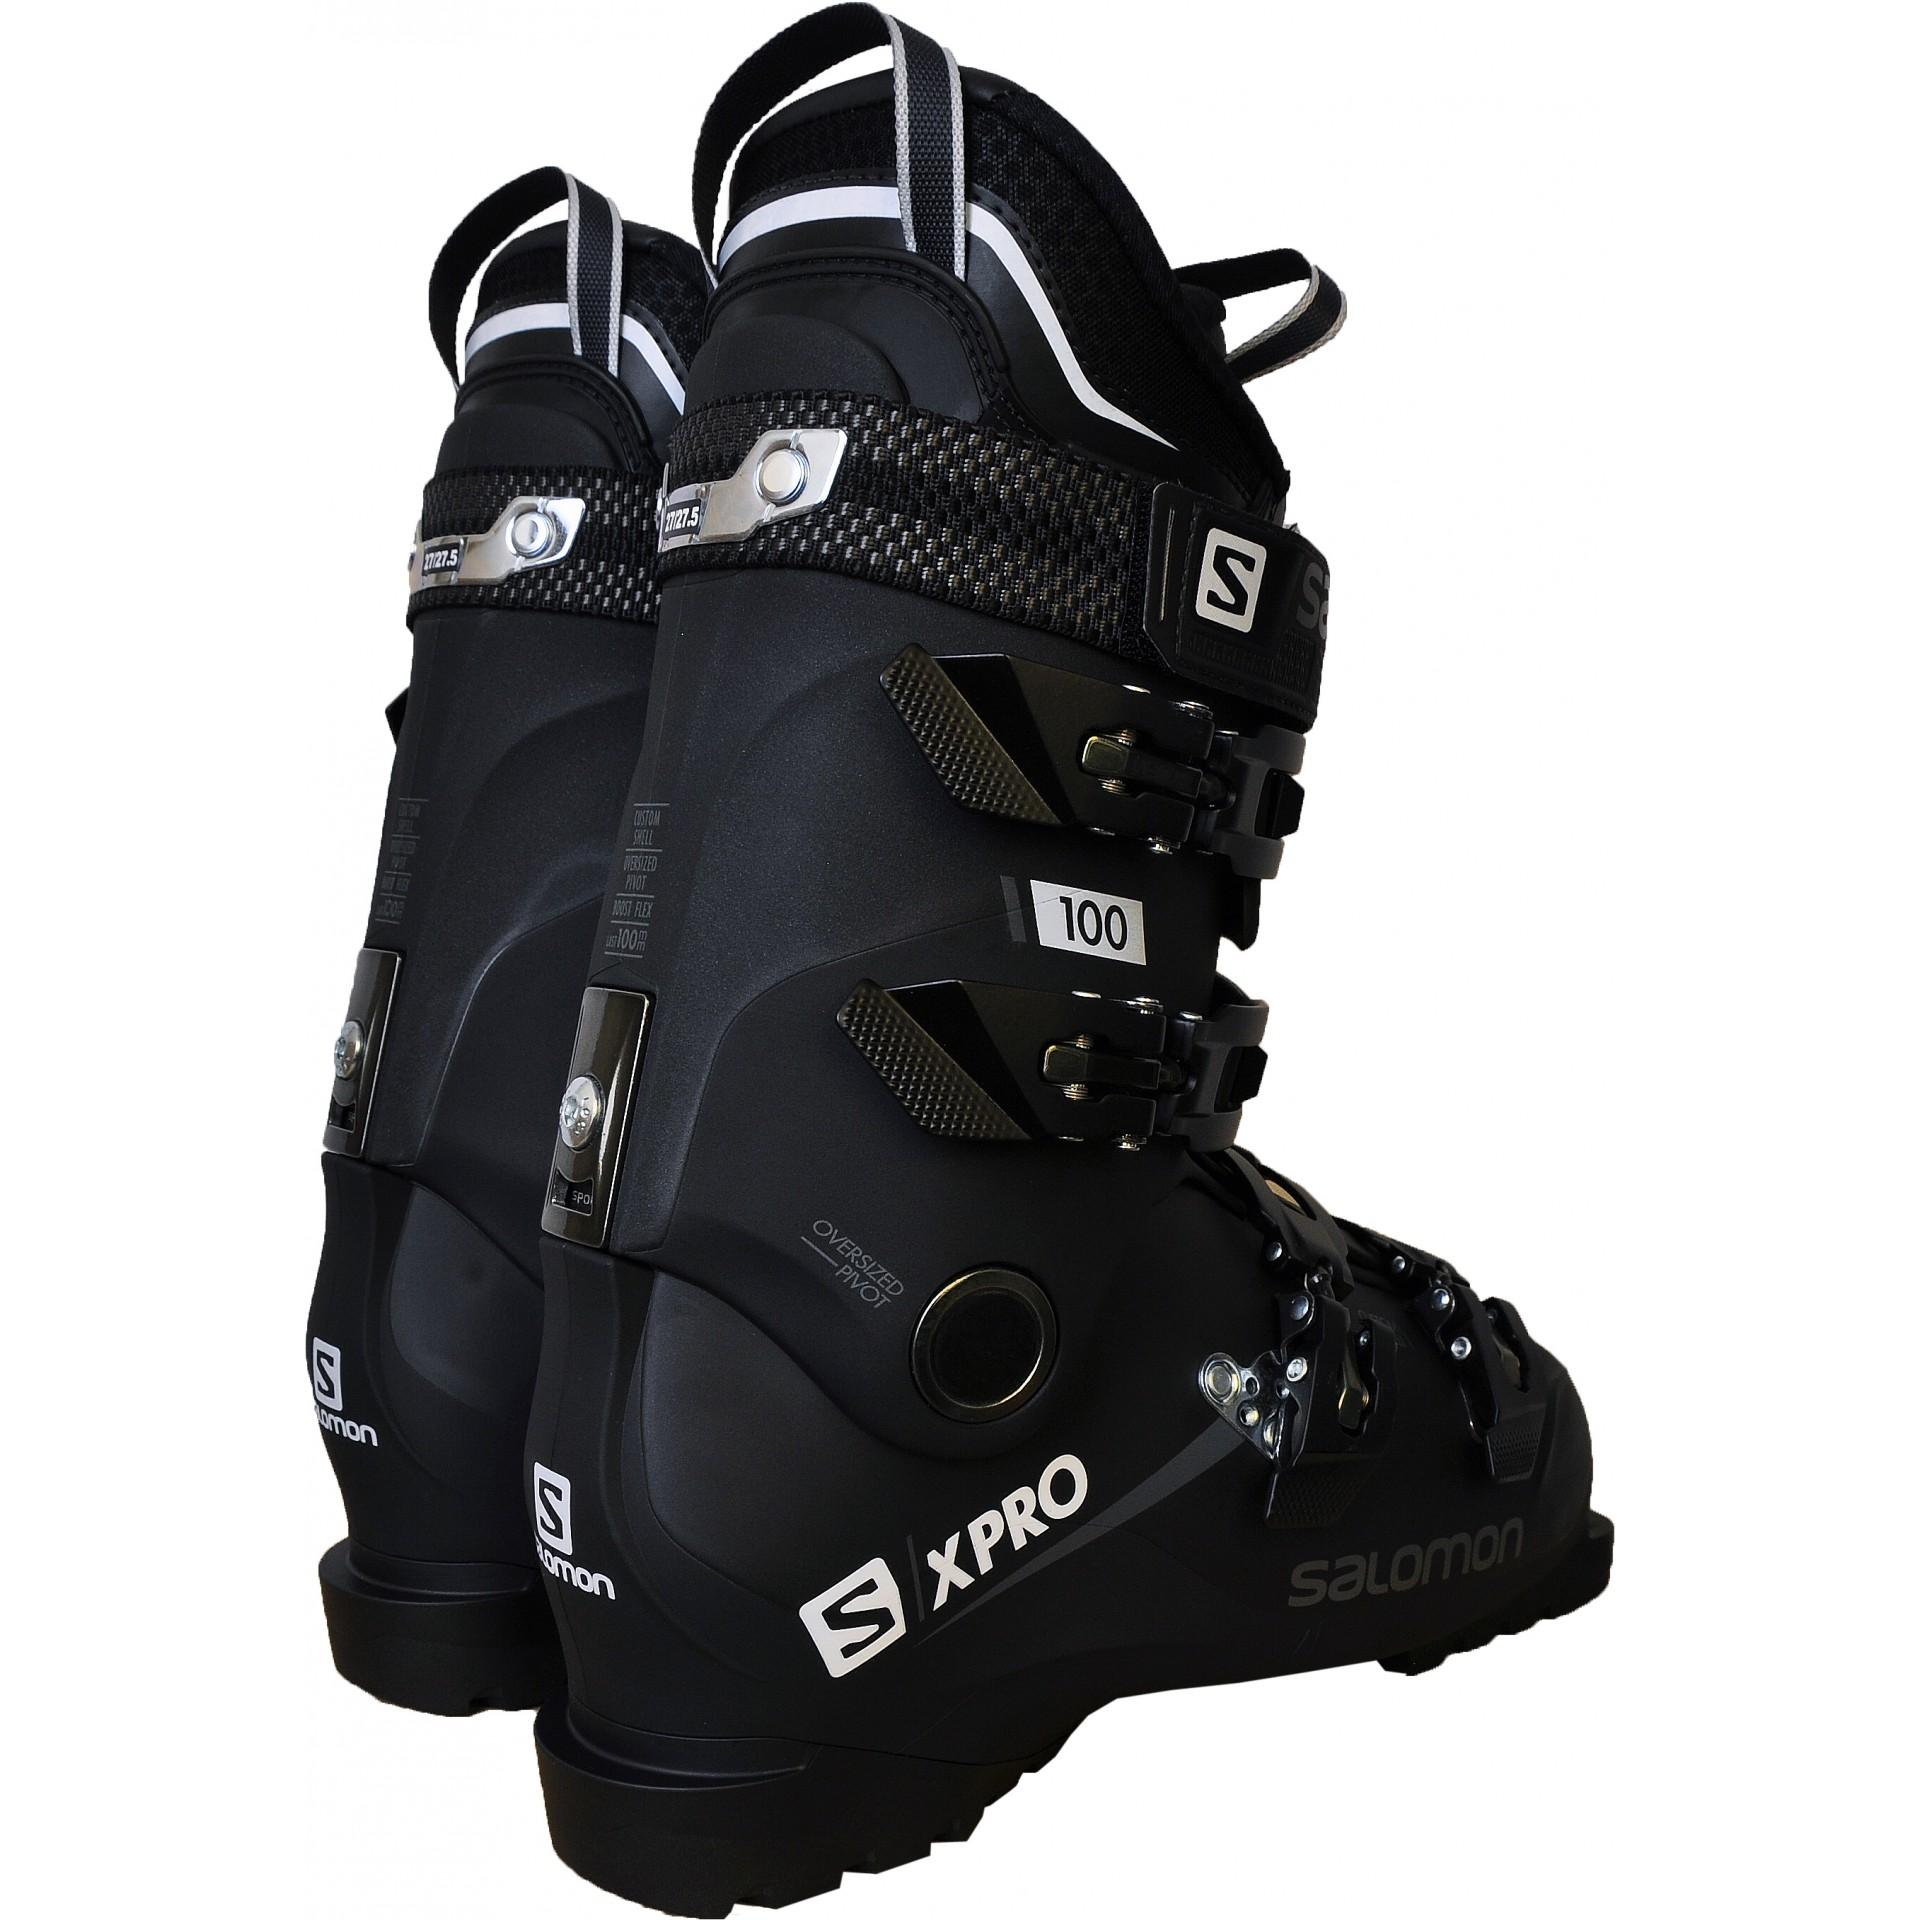 Buty Salomon X Pro 100 Black 2019